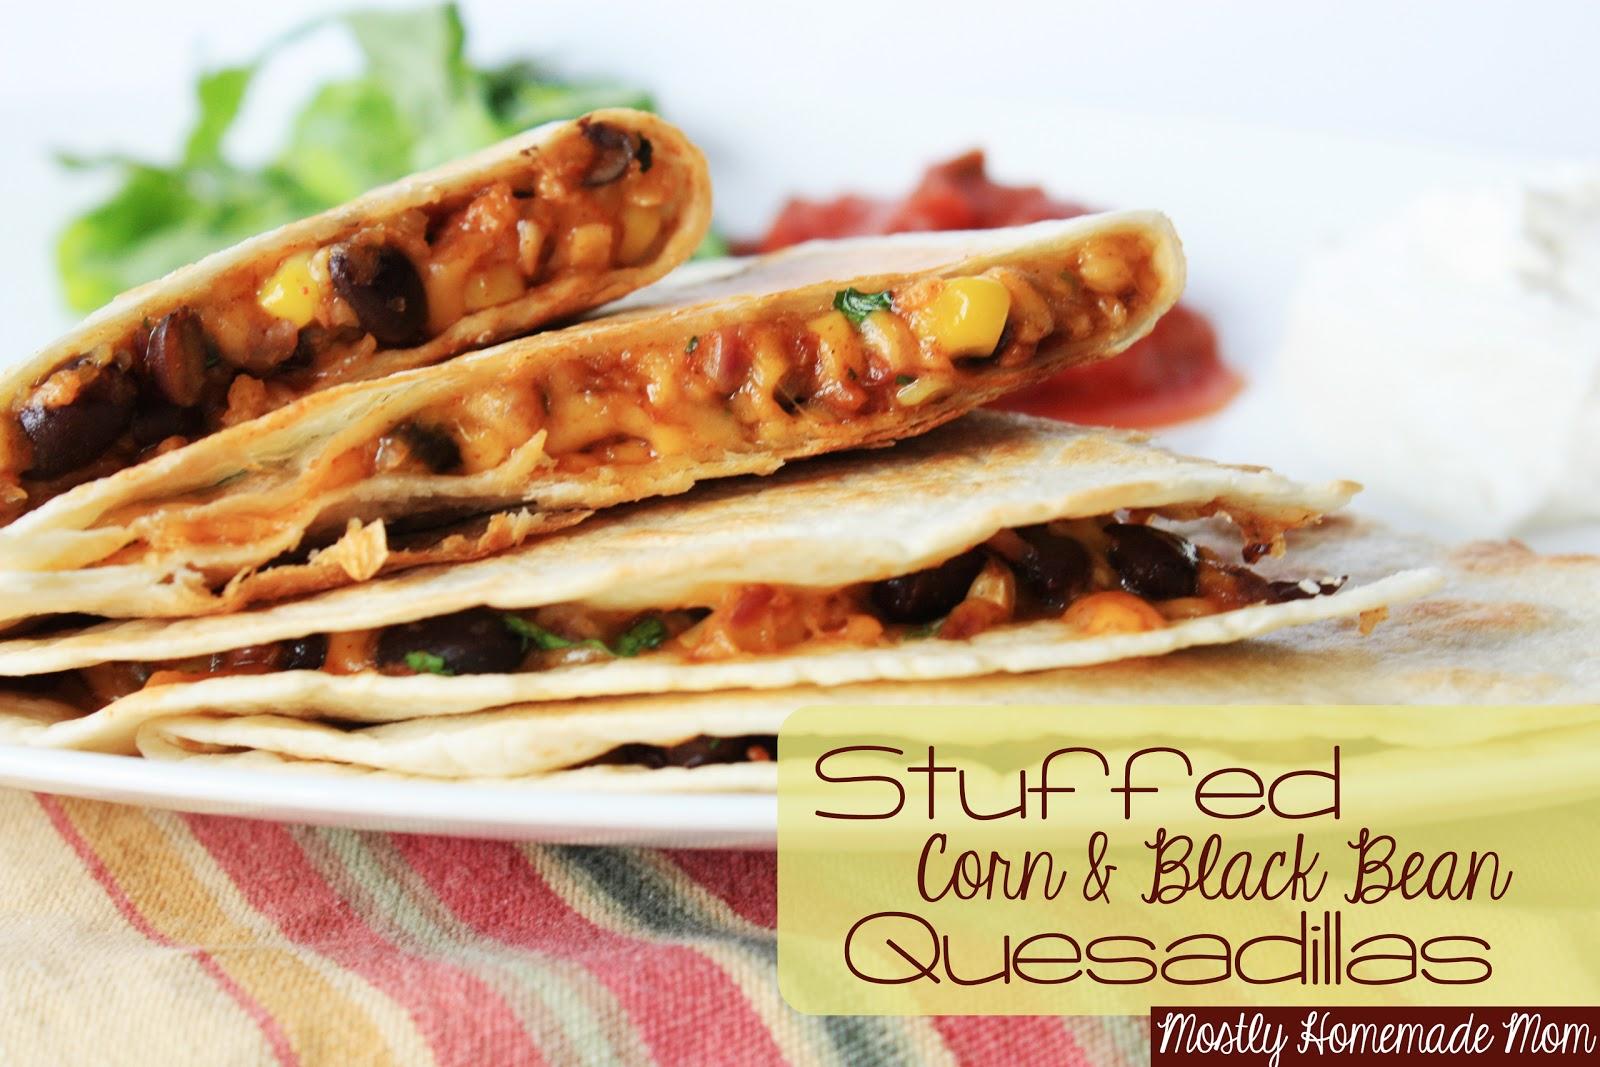 Stuffed+Corn+%26+Back+Bean+Quesadillas+1.jpg